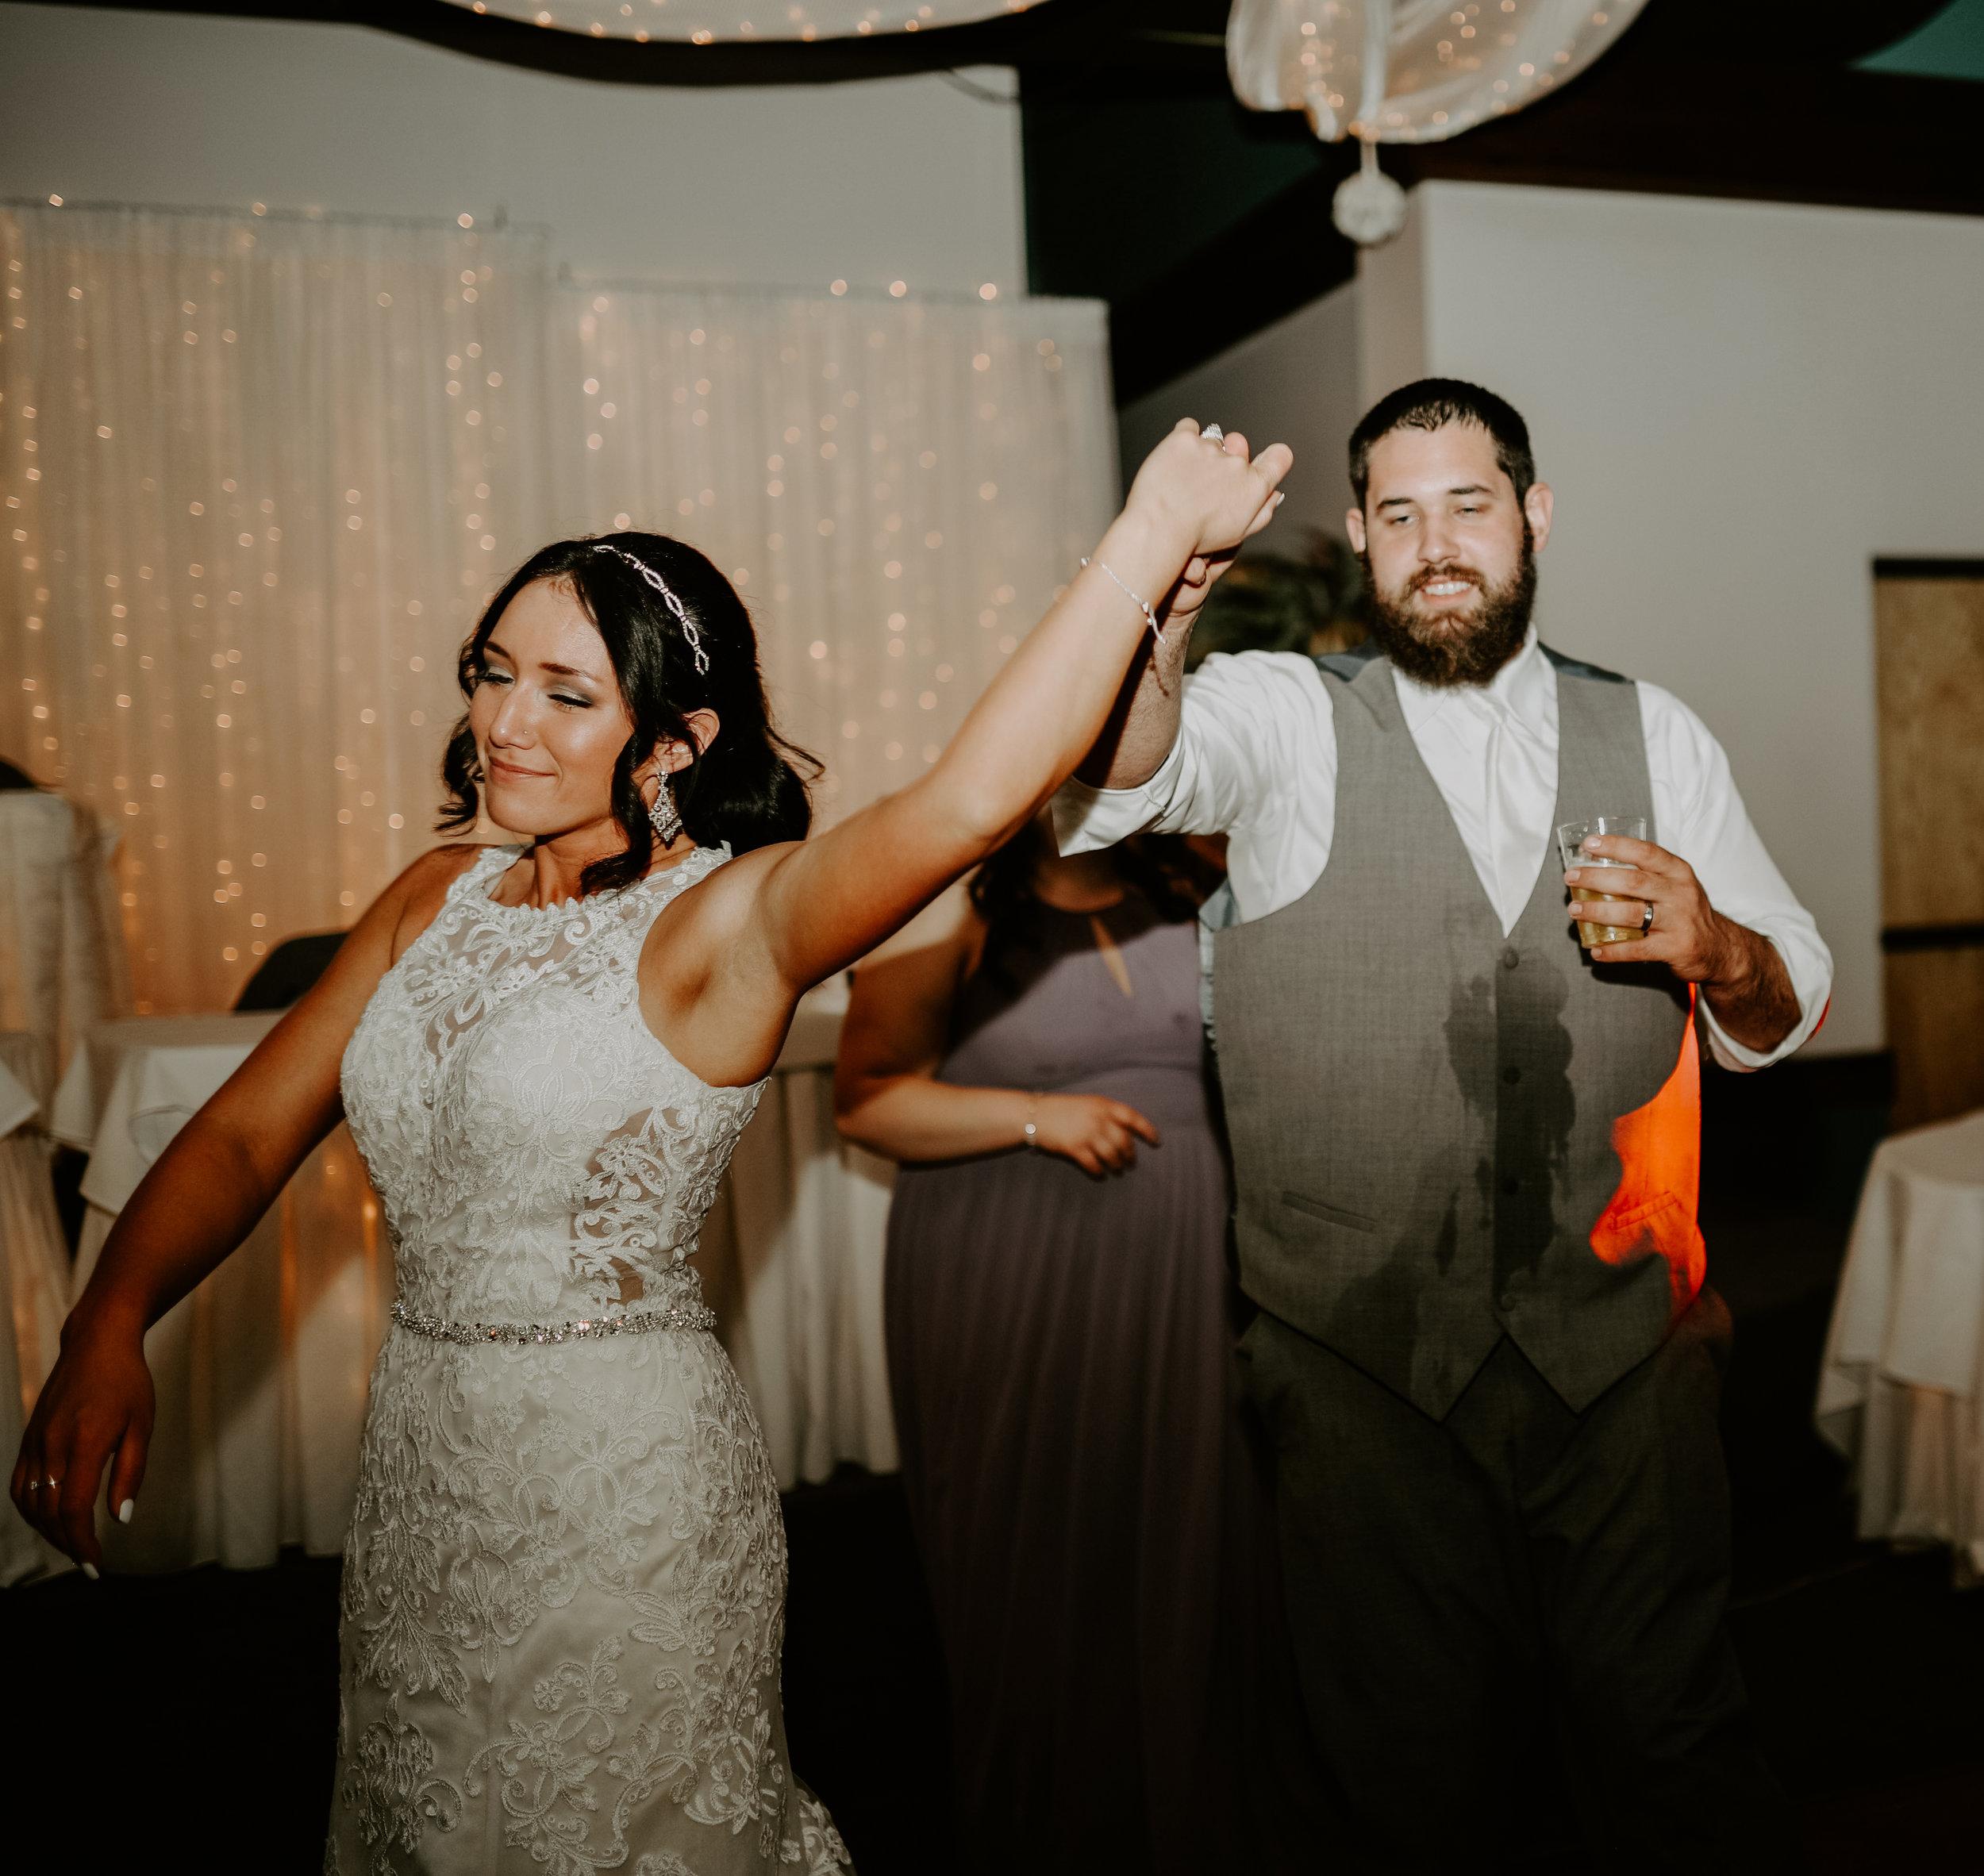 Kylei + Jordan wedding 465 (1 of 1).jpg